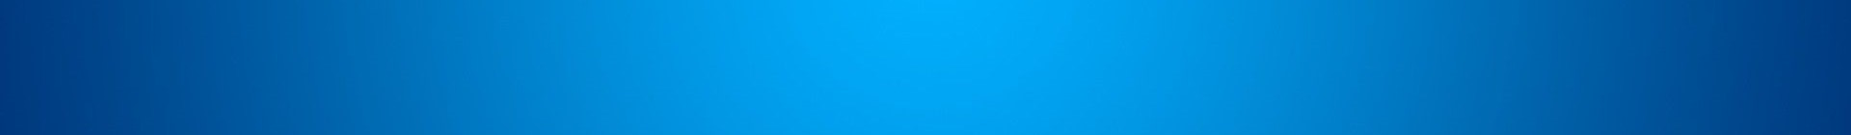 BPP Header Blue Gradient.png